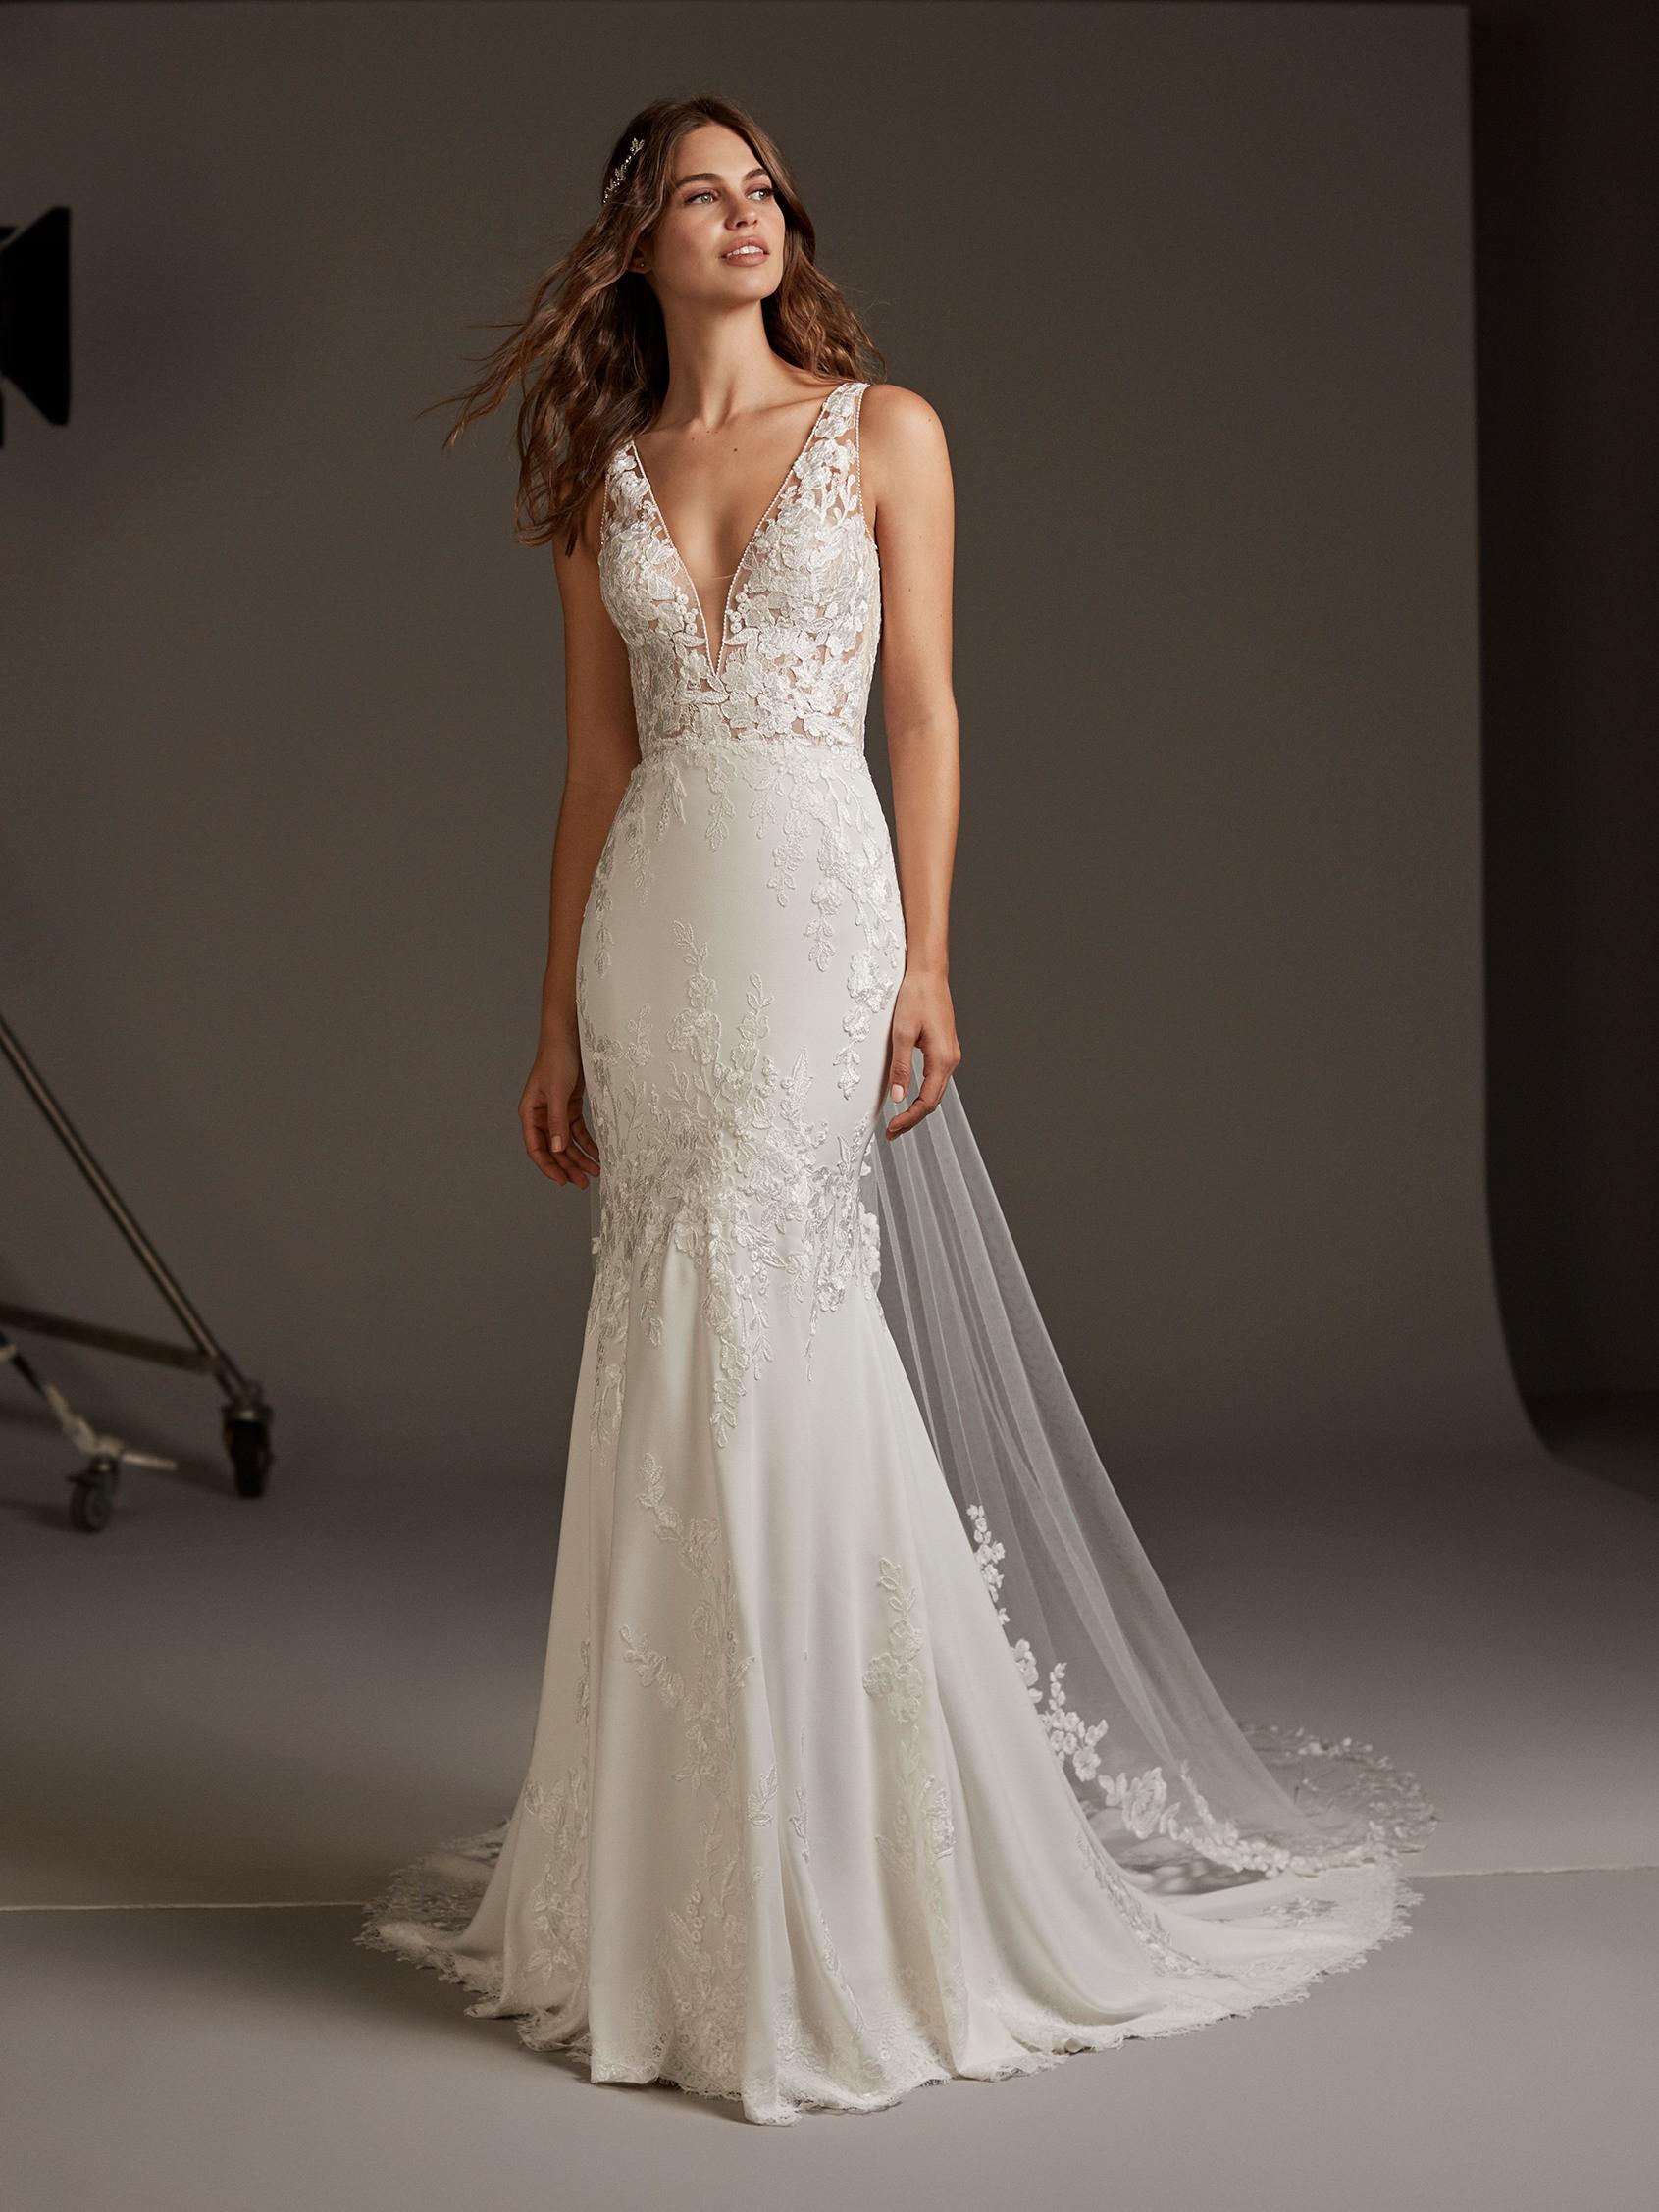 Wedding Gowns for Slim Brides -V-neckline Wedding dresses